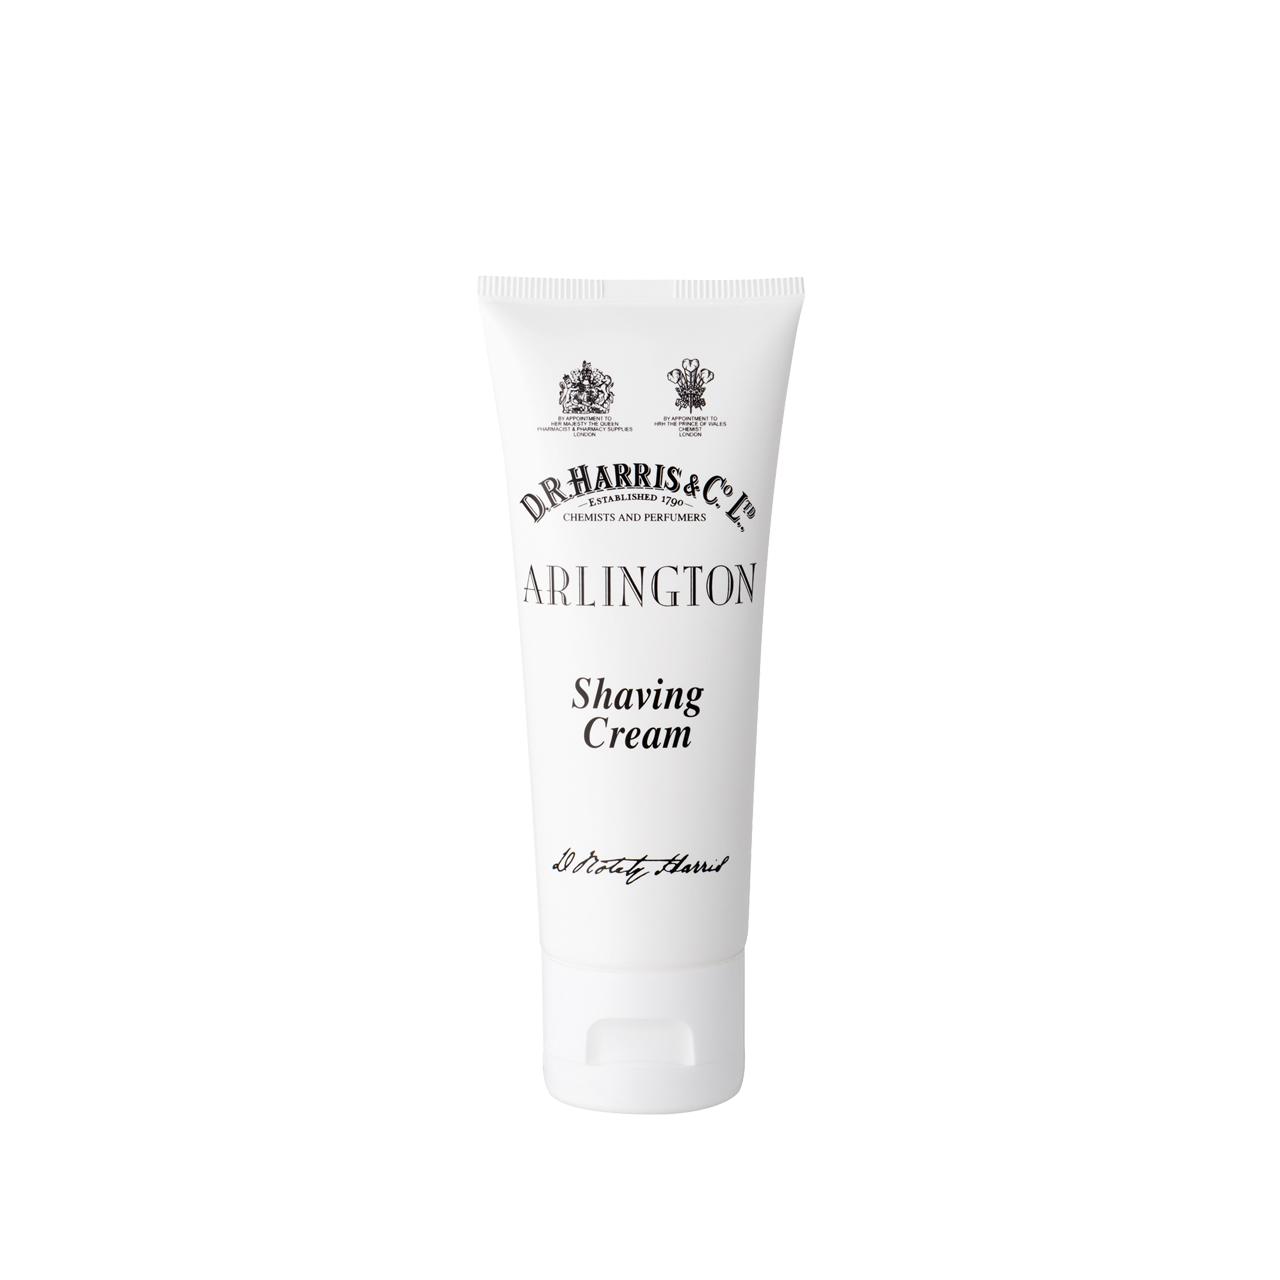 Arlington - Shaving Cream Tube